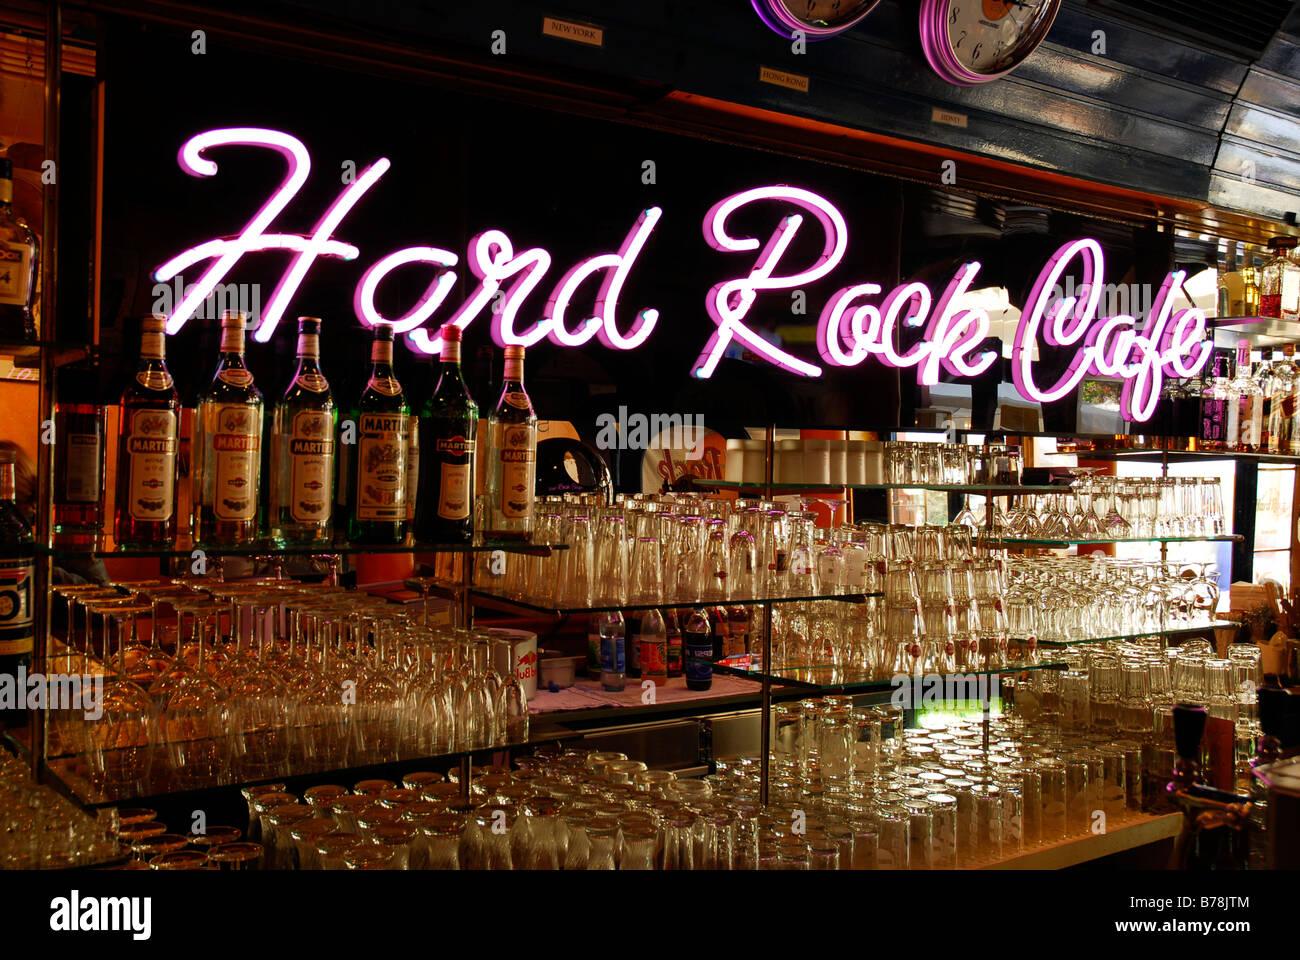 Gasthaus Rock Cafe